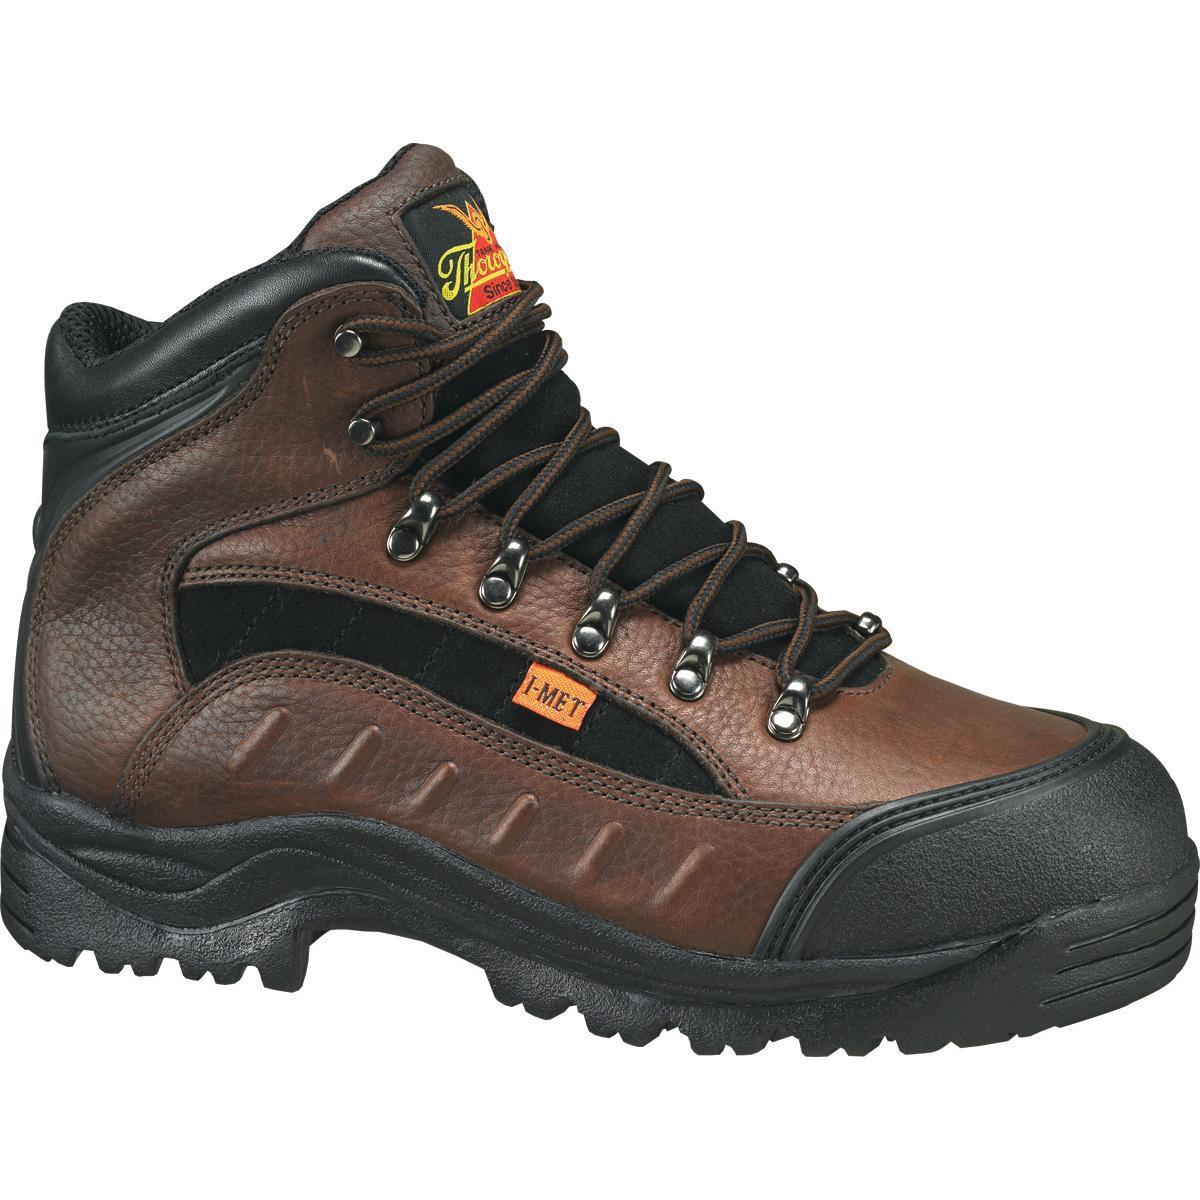 b0689747fc1 Thorogood Women's Steel Toe Internal Metatarsal Work Boot, #5044312